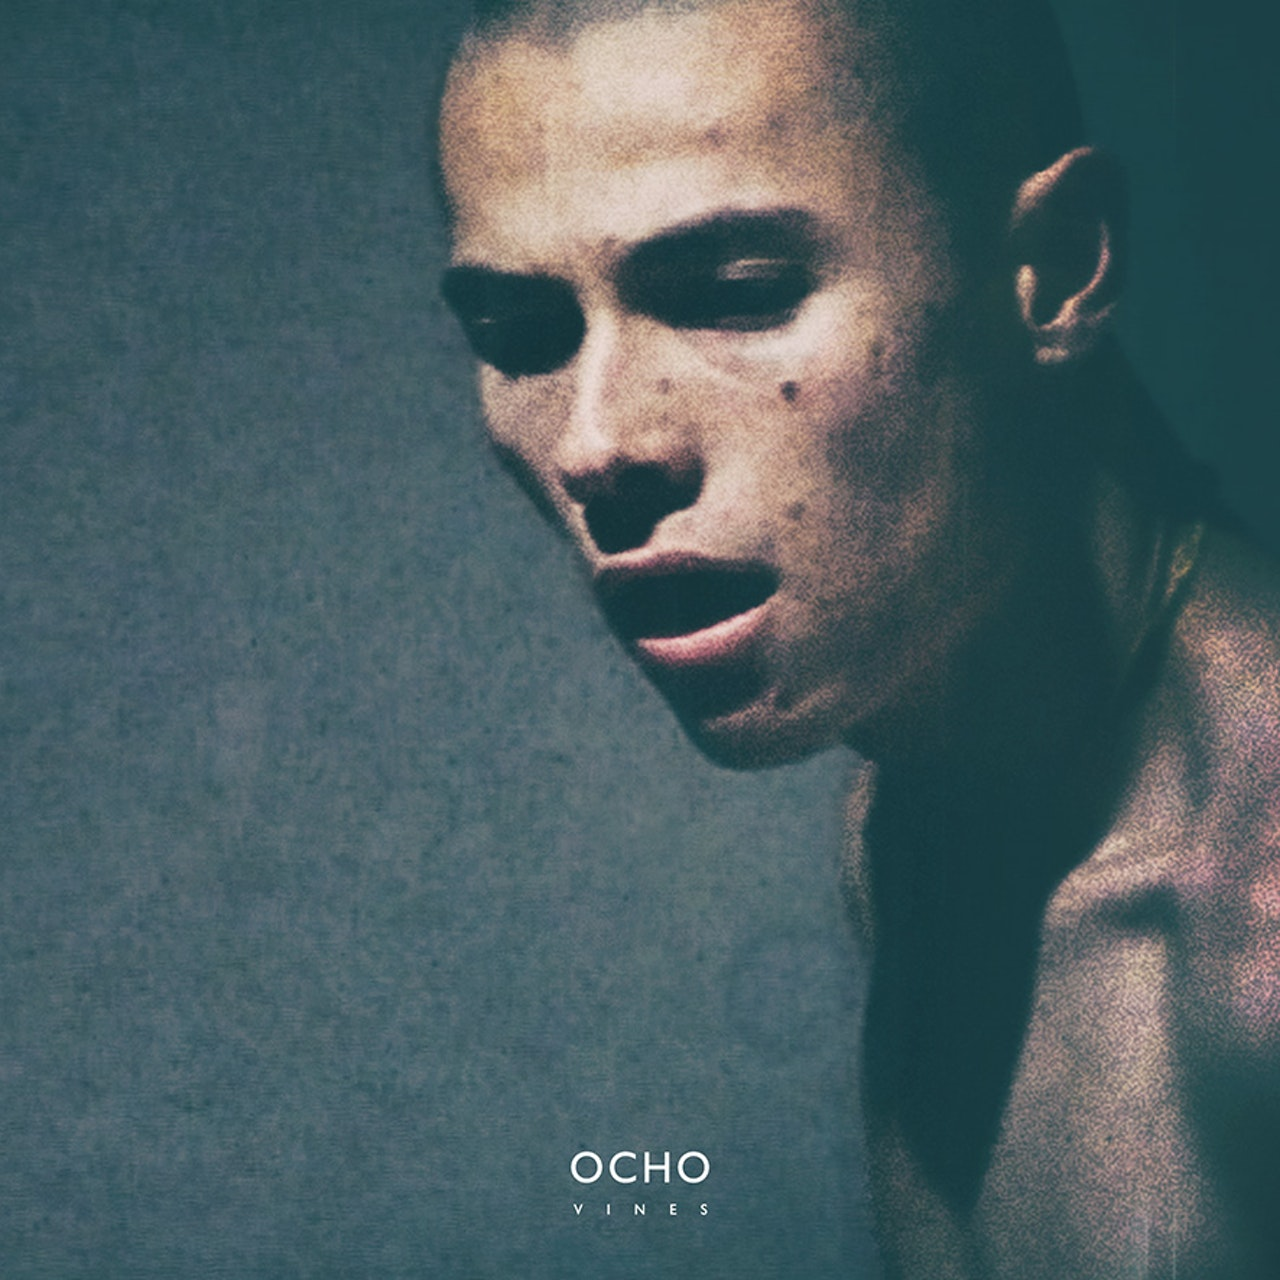 Ocho - Vines (Single) ~ 2016